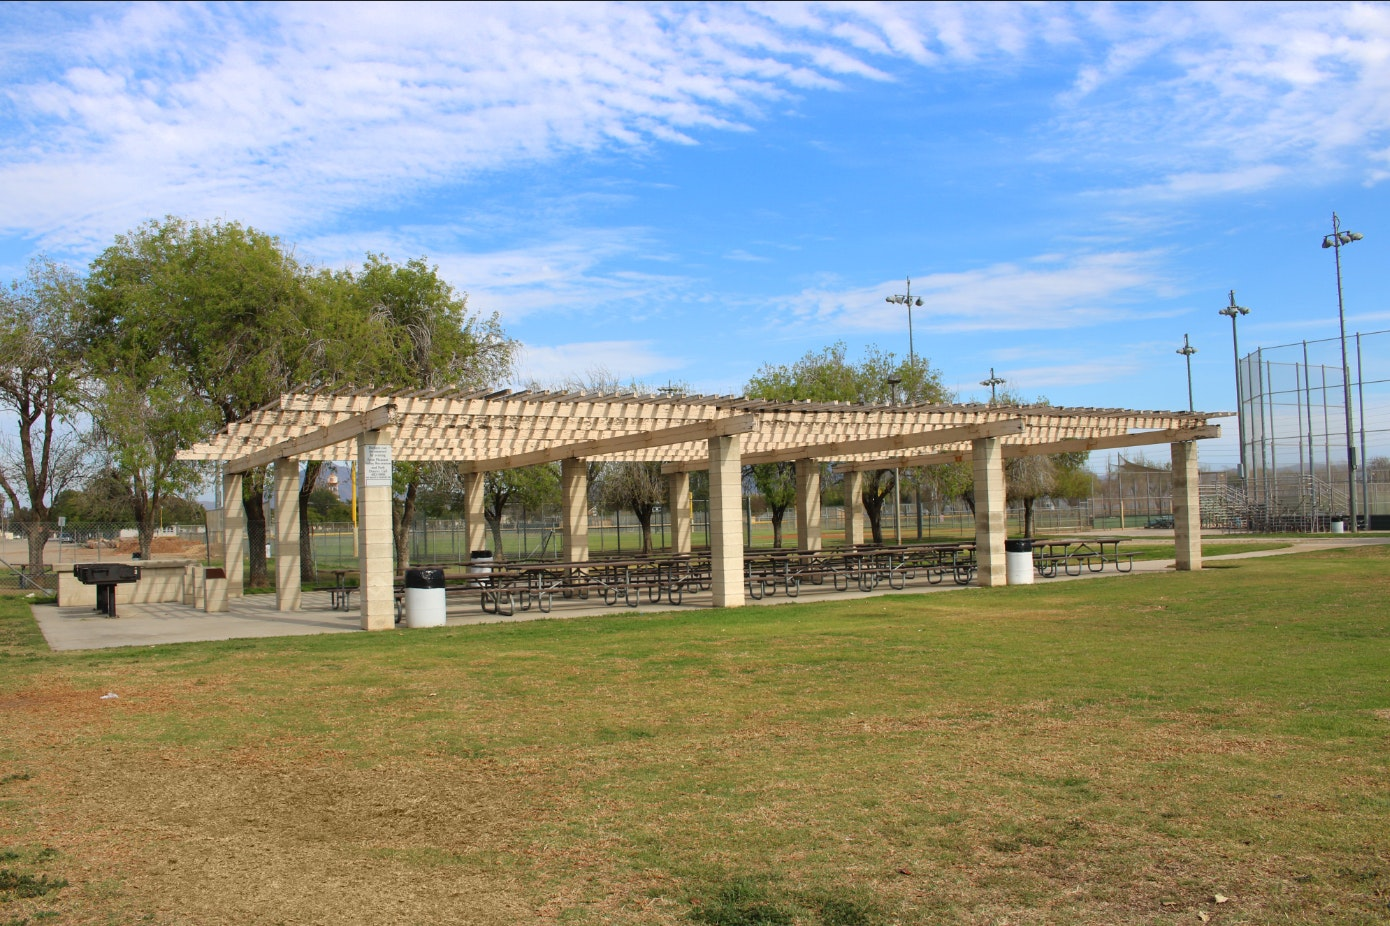 Freedom Park picnic shelter